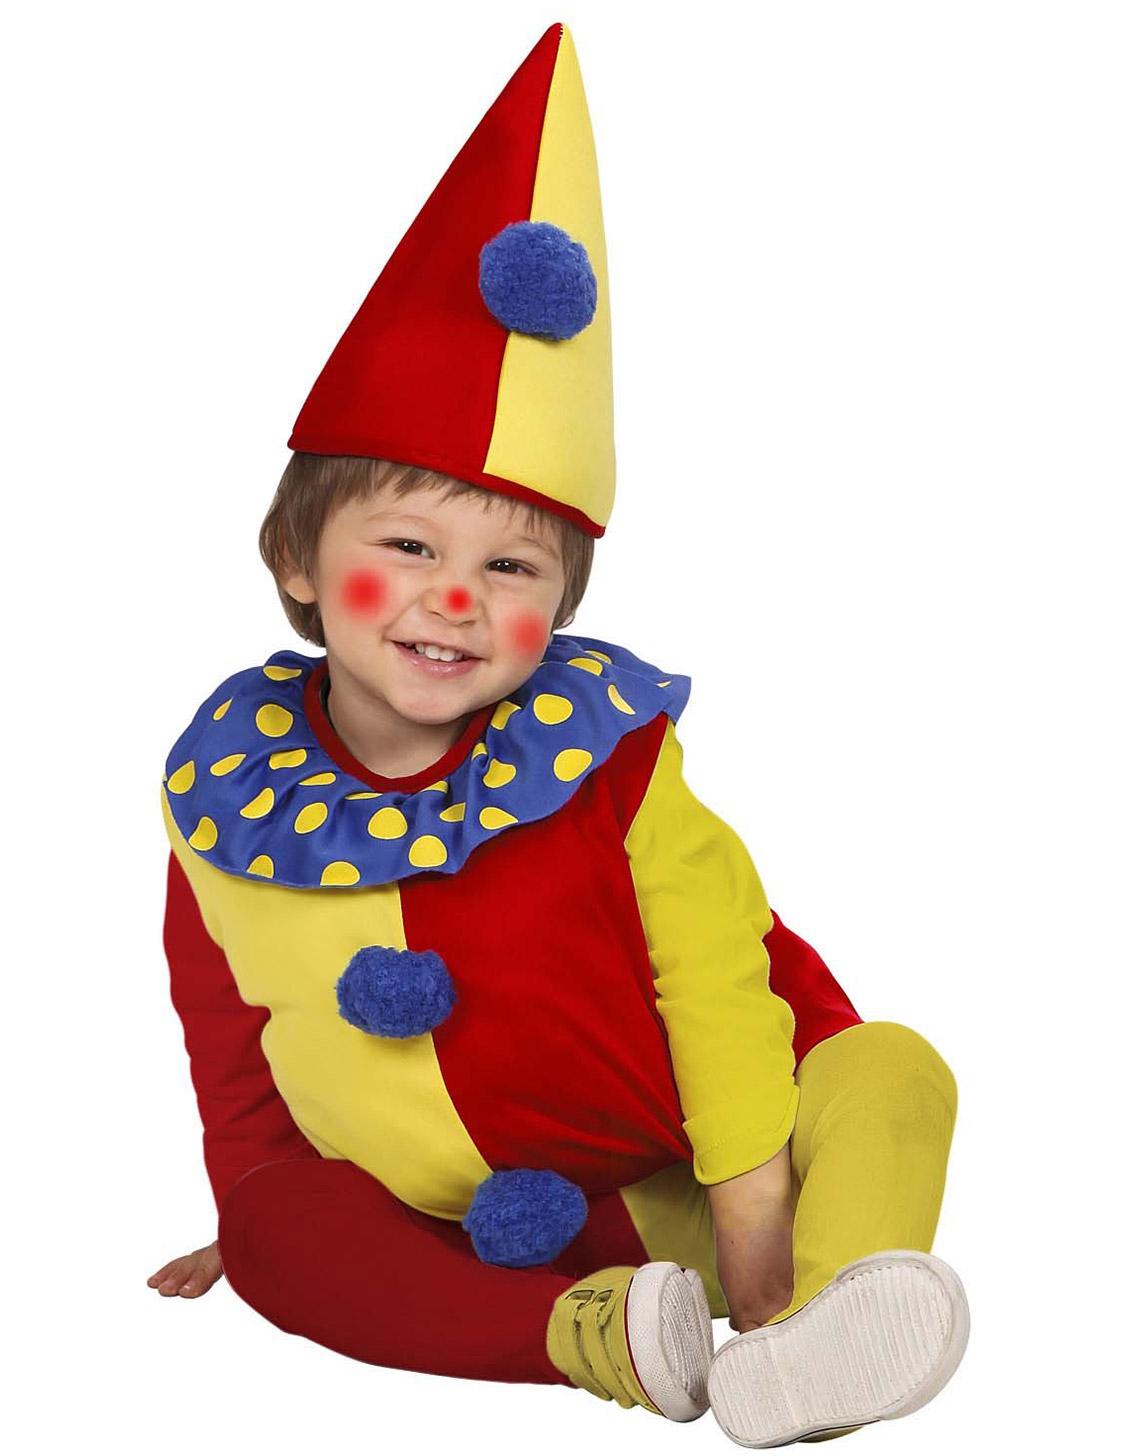 rot gelbes clowns kost m f r kinder kost me f r kinder und g nstige faschingskost me vegaoo. Black Bedroom Furniture Sets. Home Design Ideas